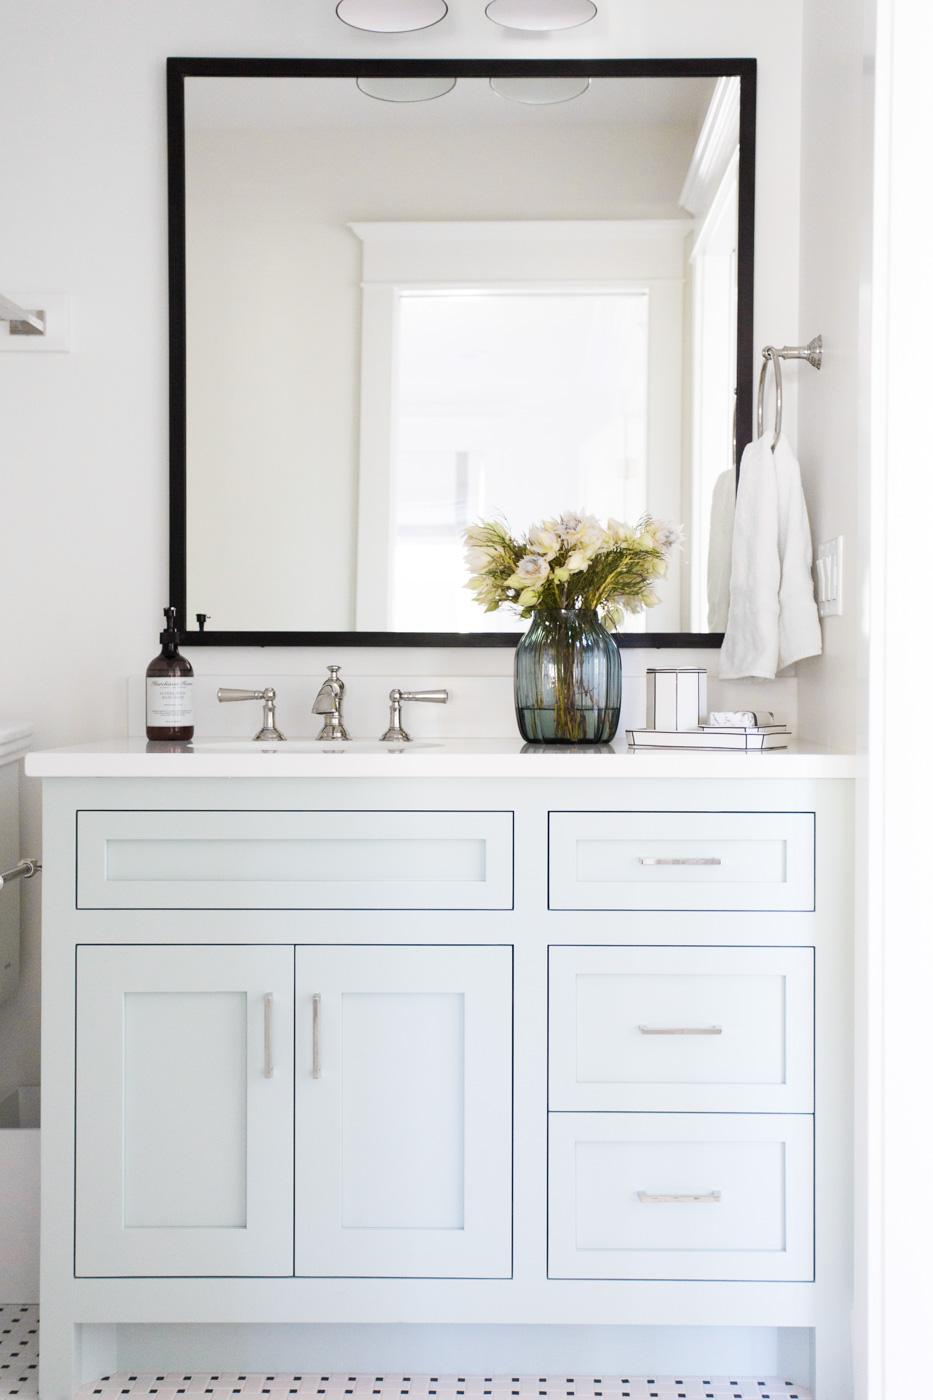 Full view of bathroom vanity of child's bathroom